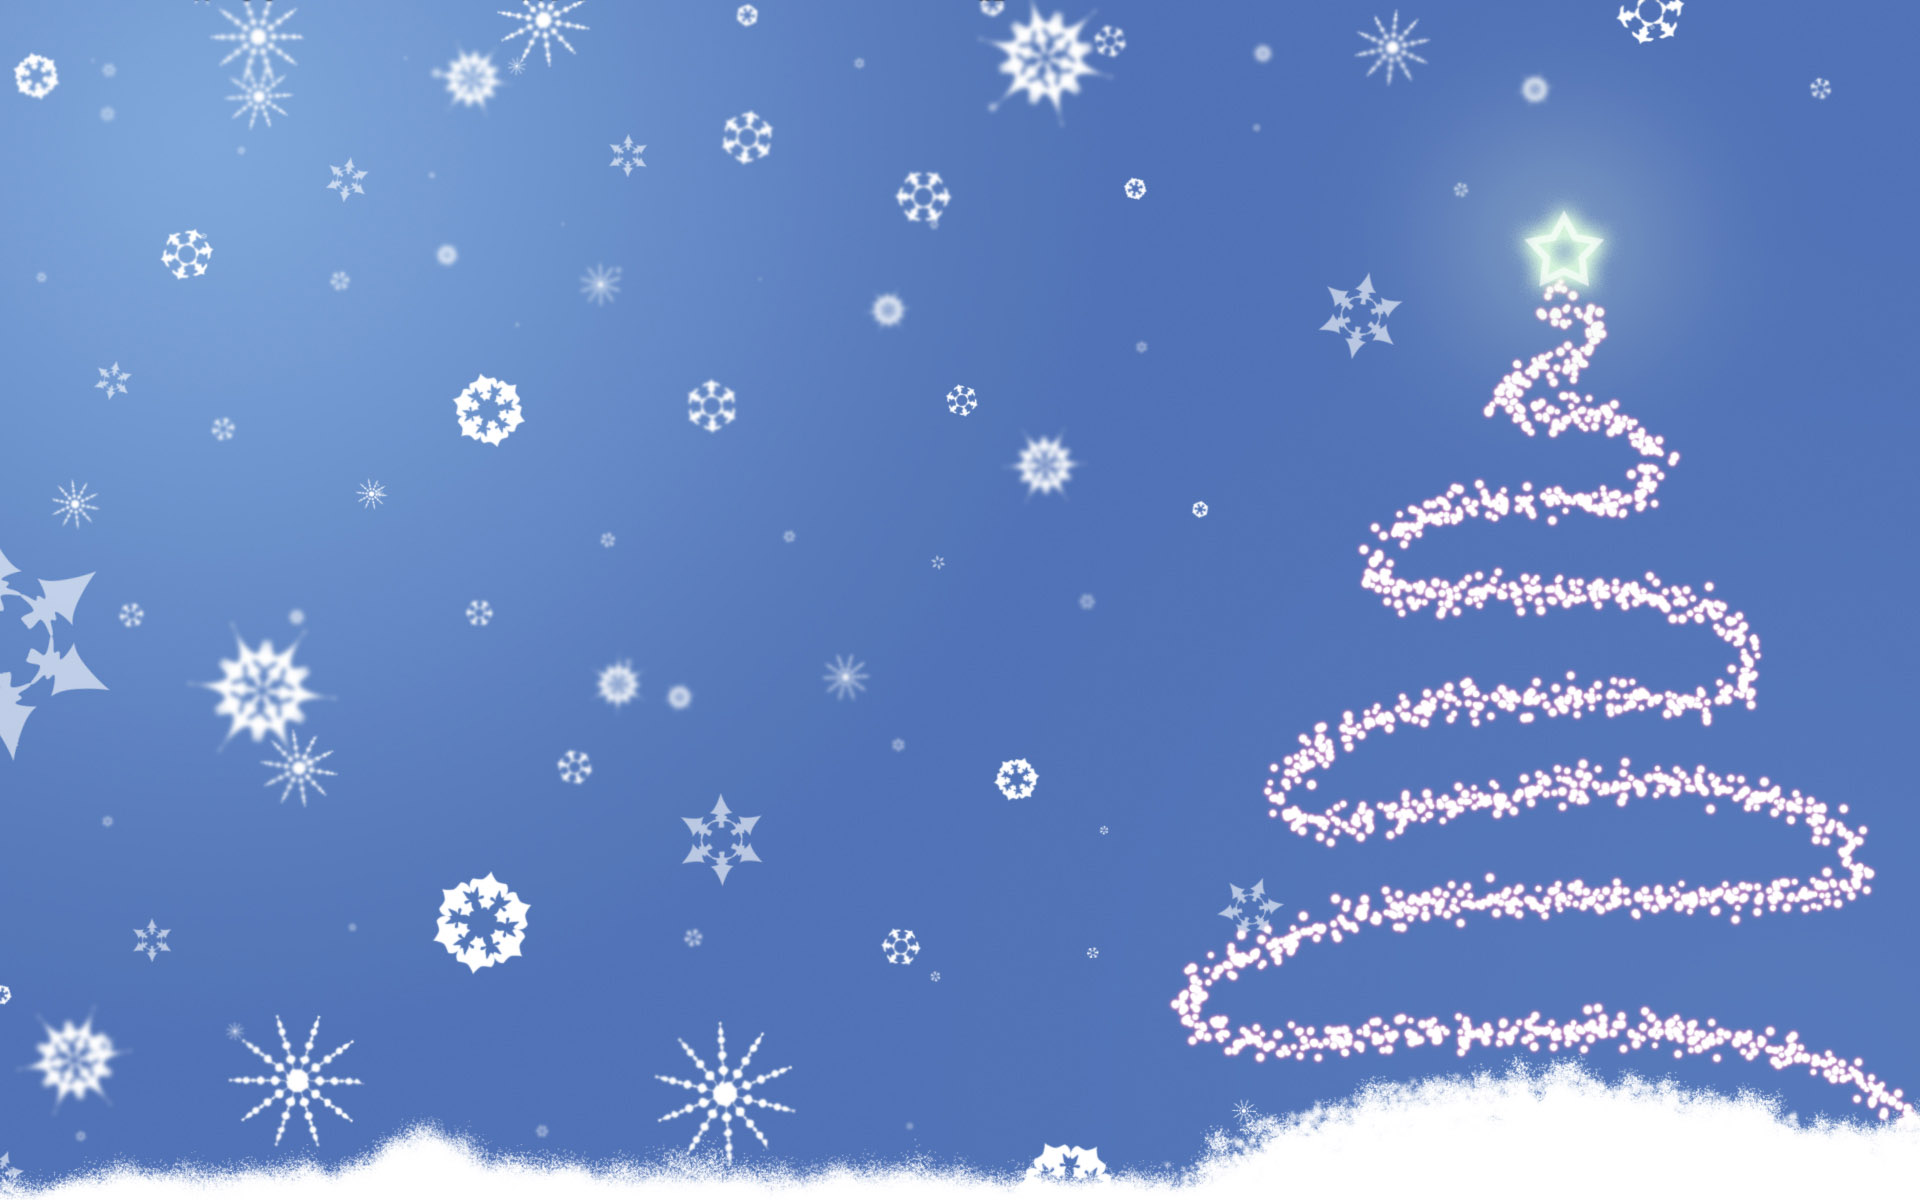 Christmas Background wallpaper   261079 1920x1200